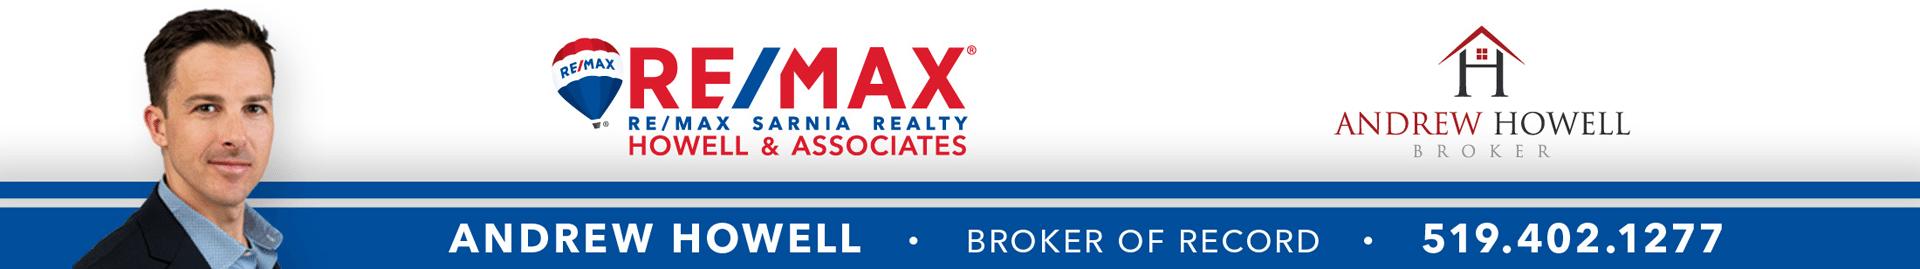 Andrew Howell – ReMax Sarnia Realty – Howell & Associates  Logo